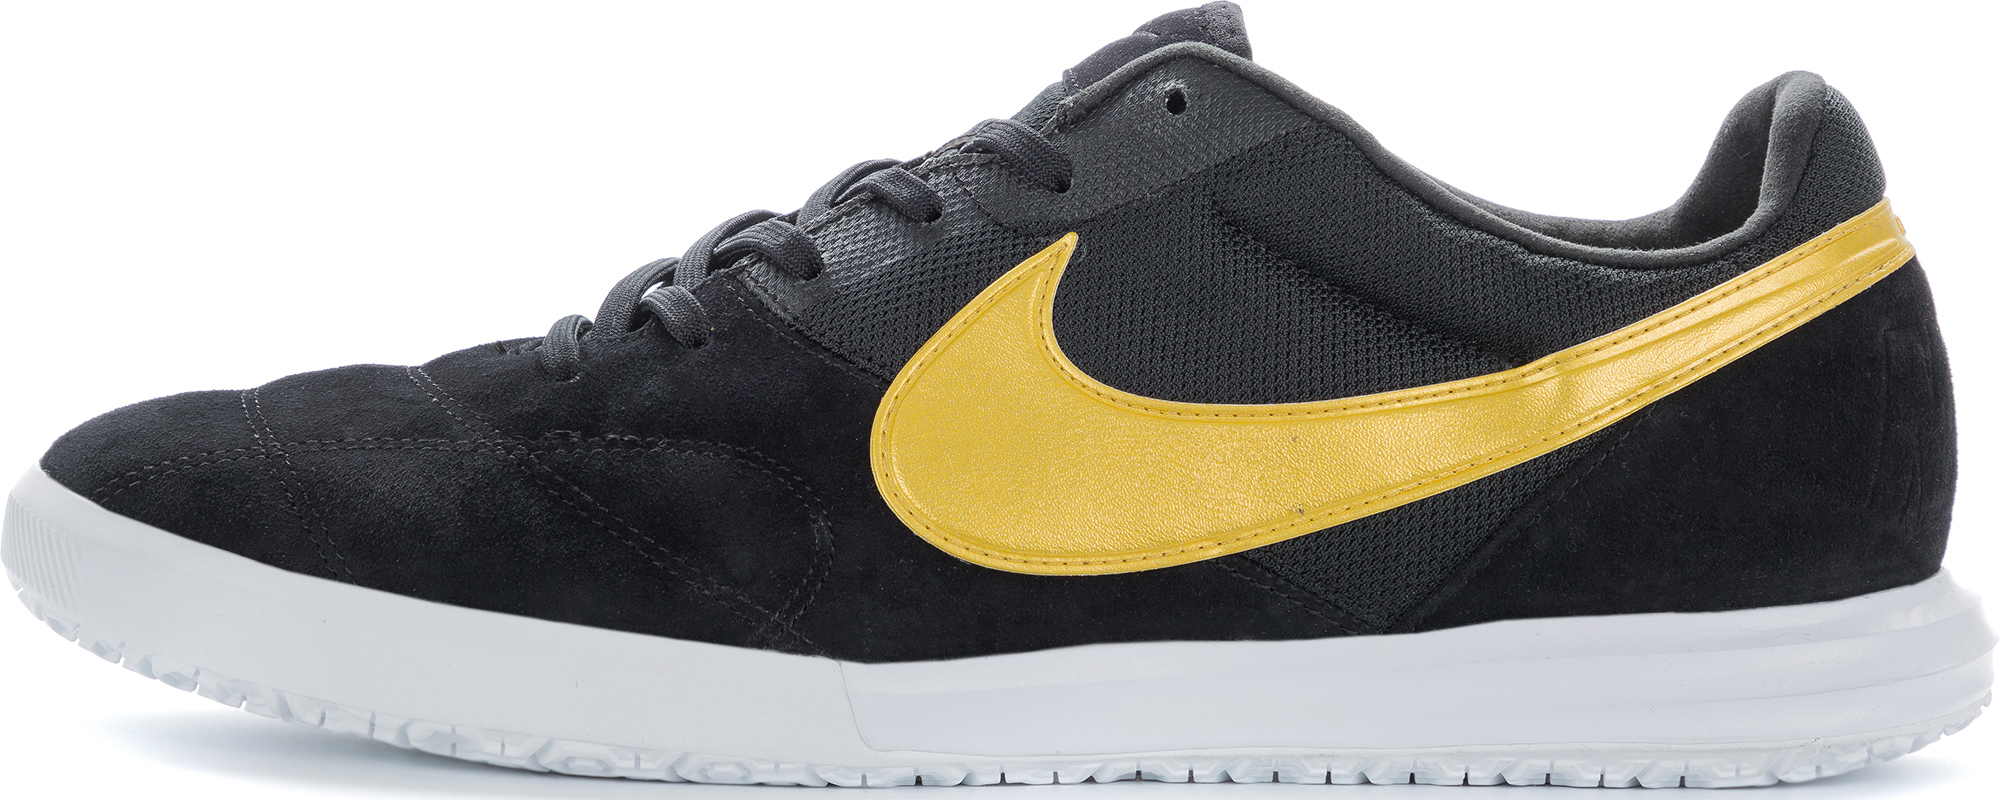 Nike Бутсы мужские Nike Premier II Sala, размер 41